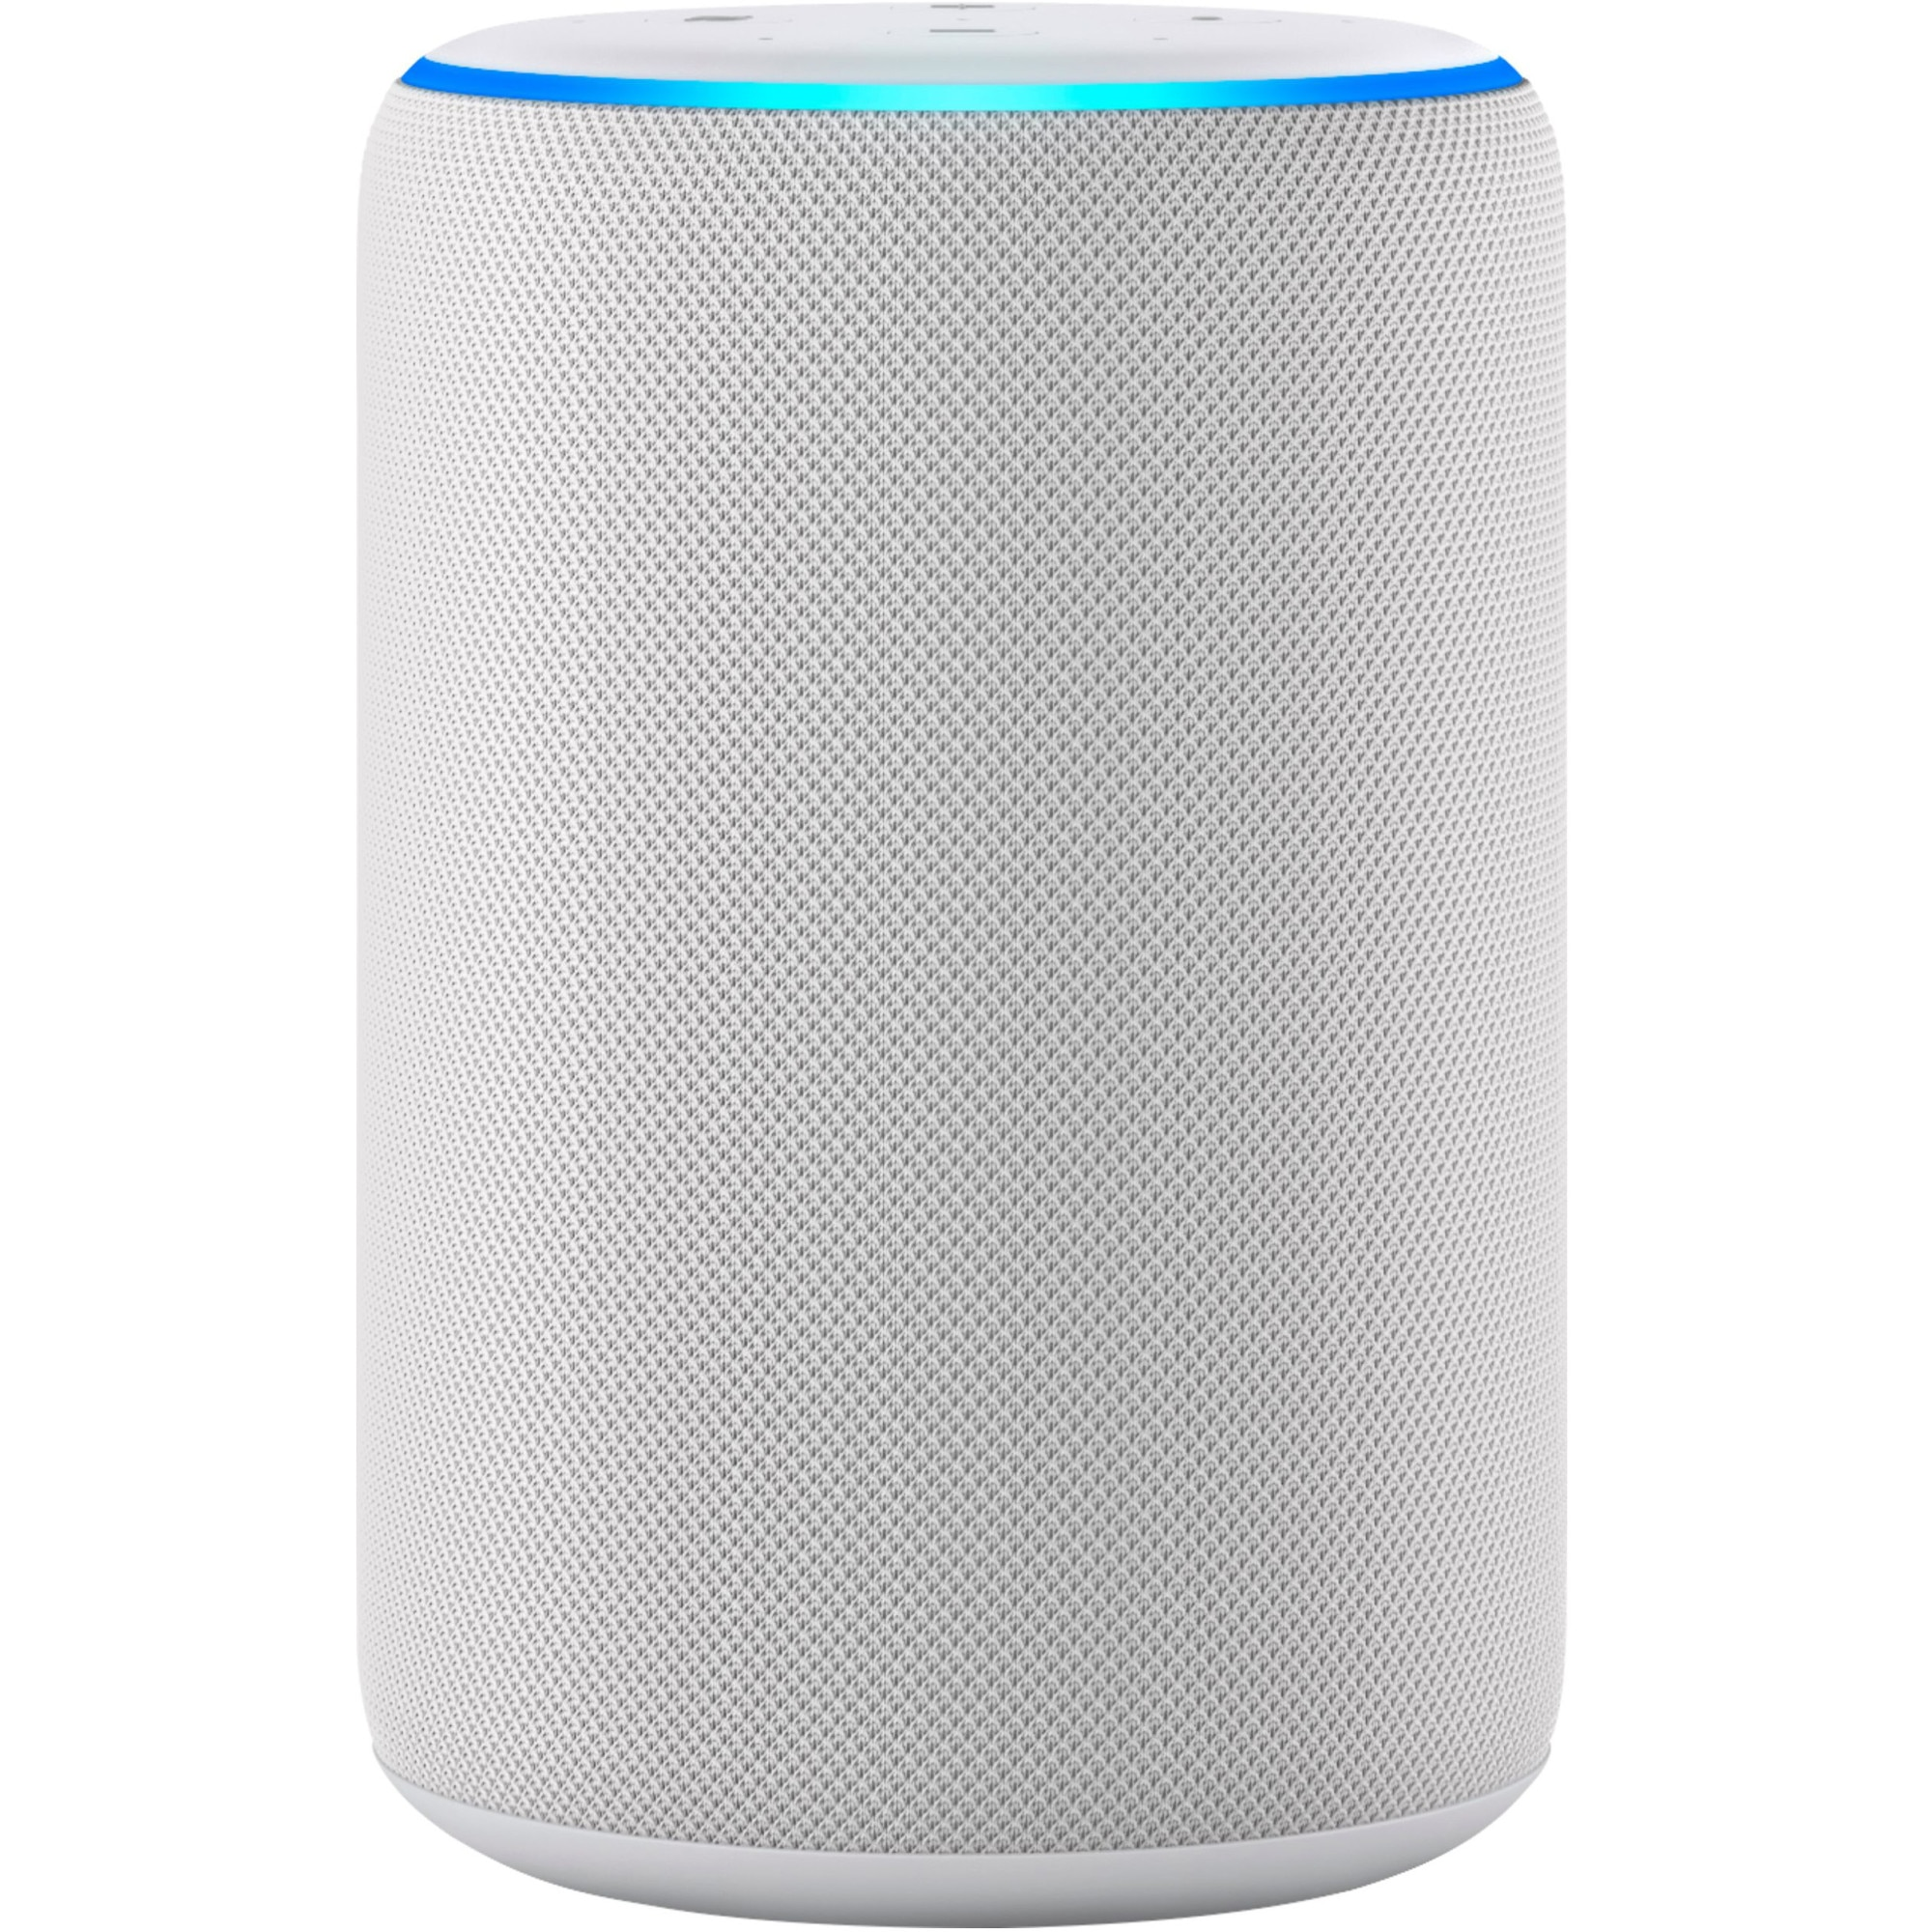 Fotografie Boxa inteligenta Amazon Echo Plus (2nd Gen), Wi-Fi, Alba